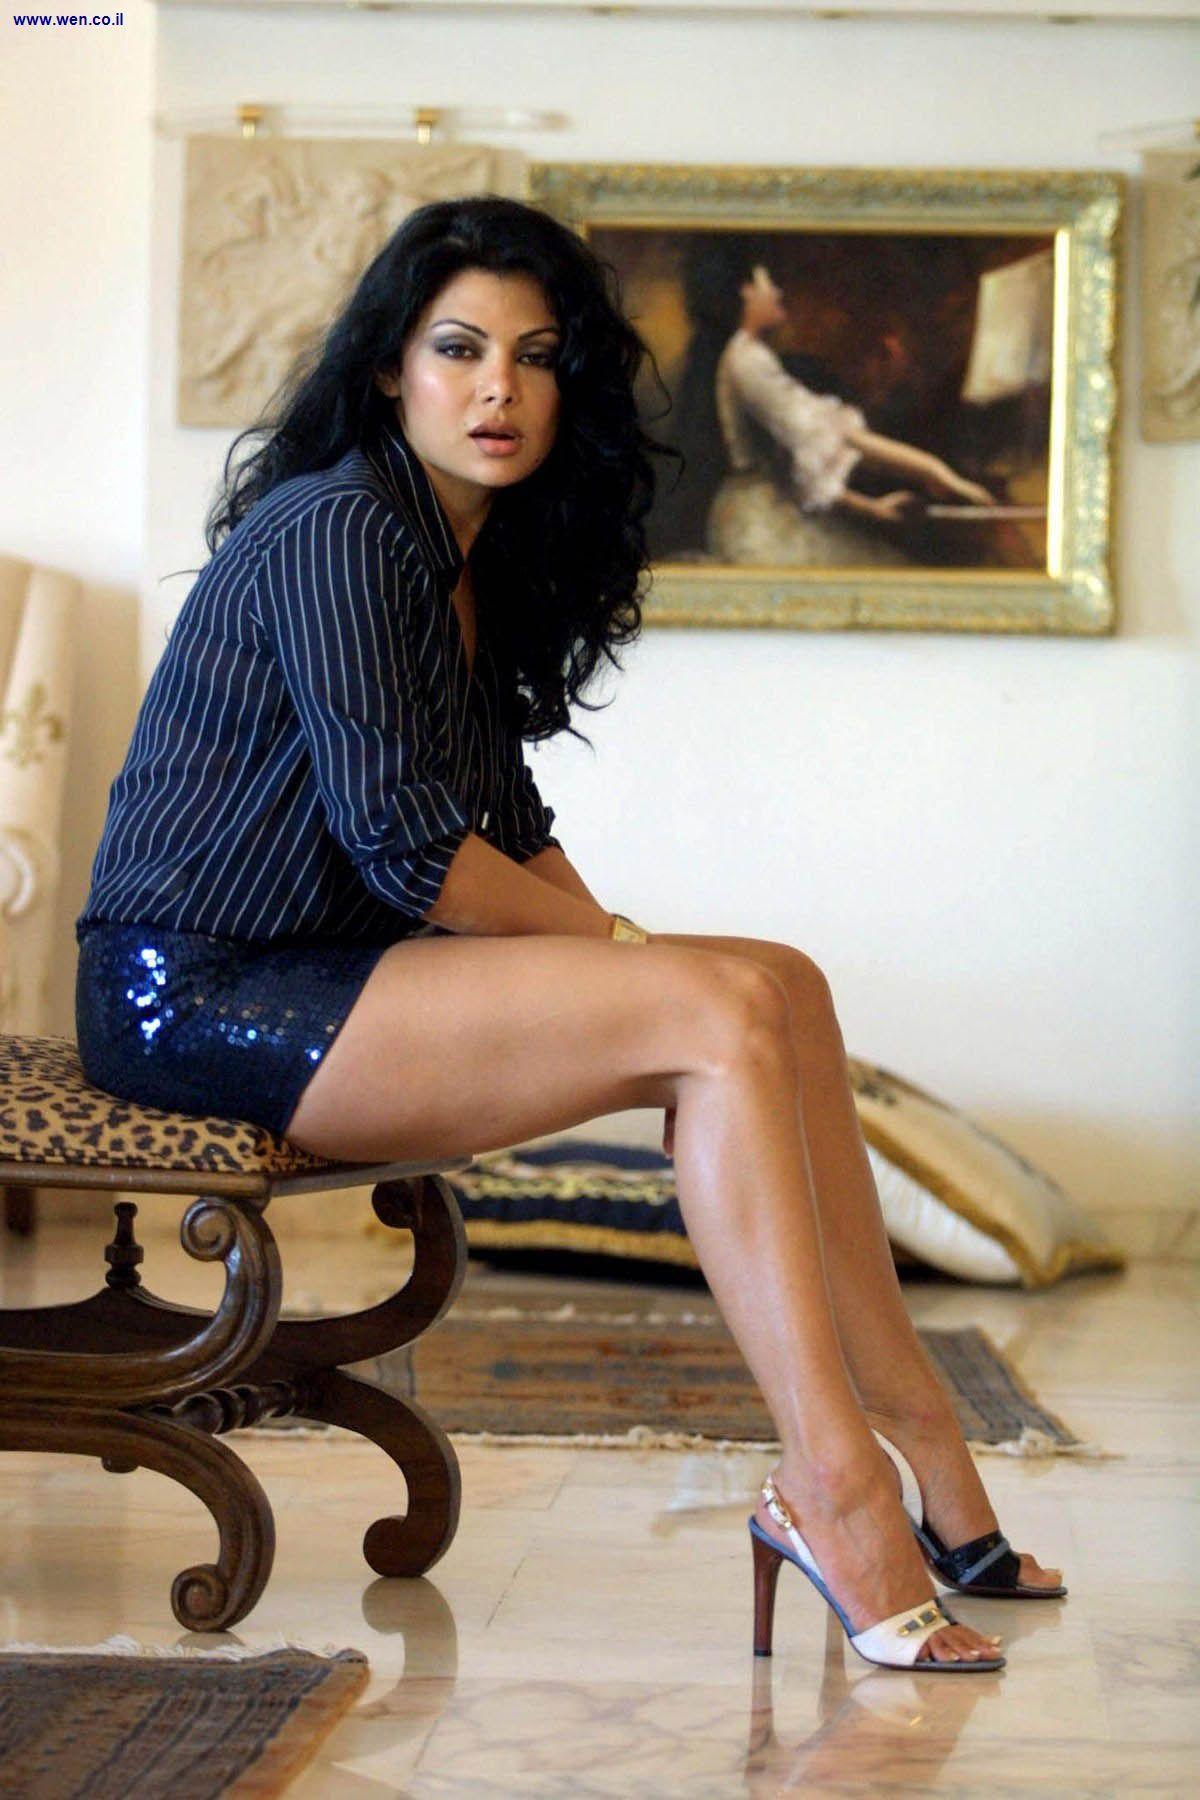 haifa wehbe | siempre bellas y famosas. | pinterest | haifa wehbe